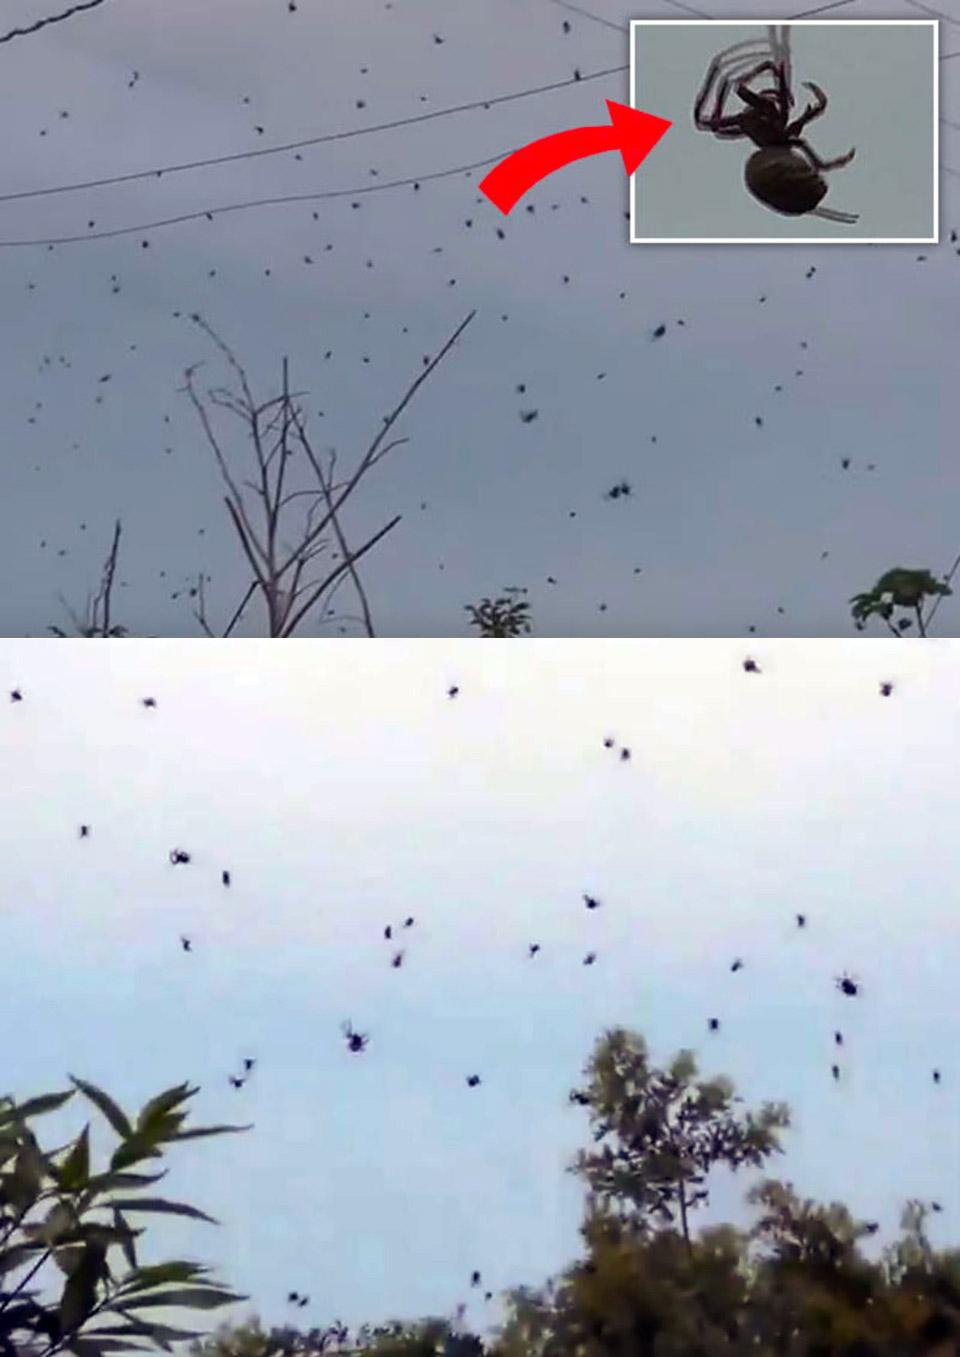 Spider Brazil Raining Spiders